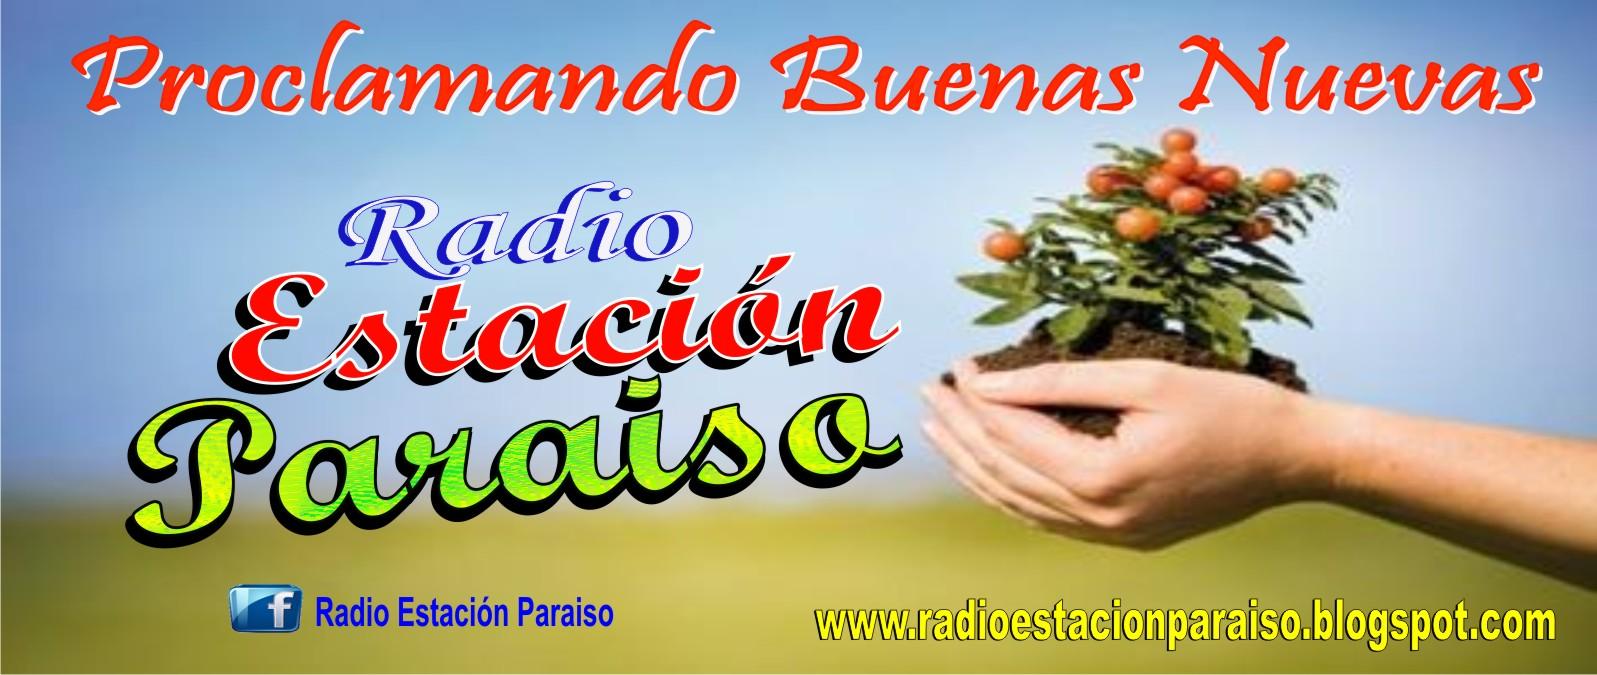 RADIO ESTACION PARAISO